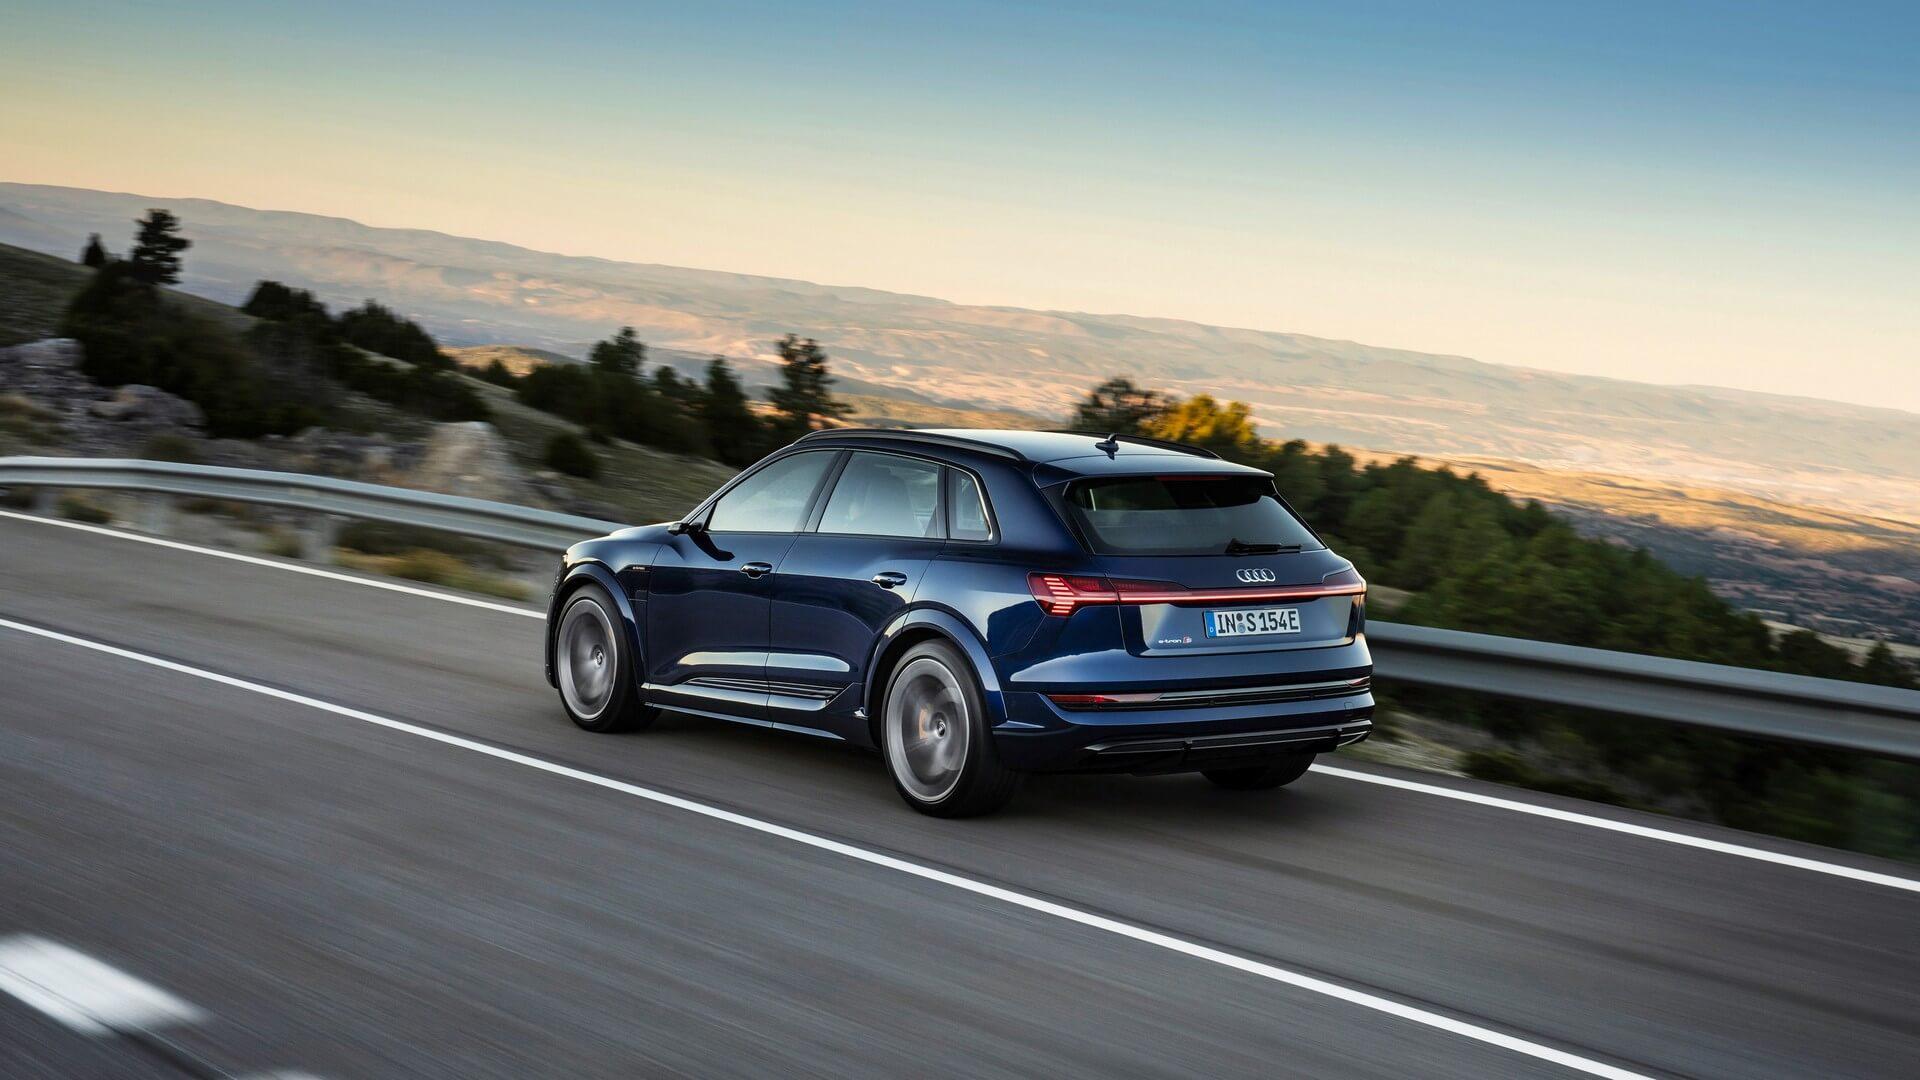 Audi-E-Tron-S-and-E-Tron-S-Sportback-2020-6